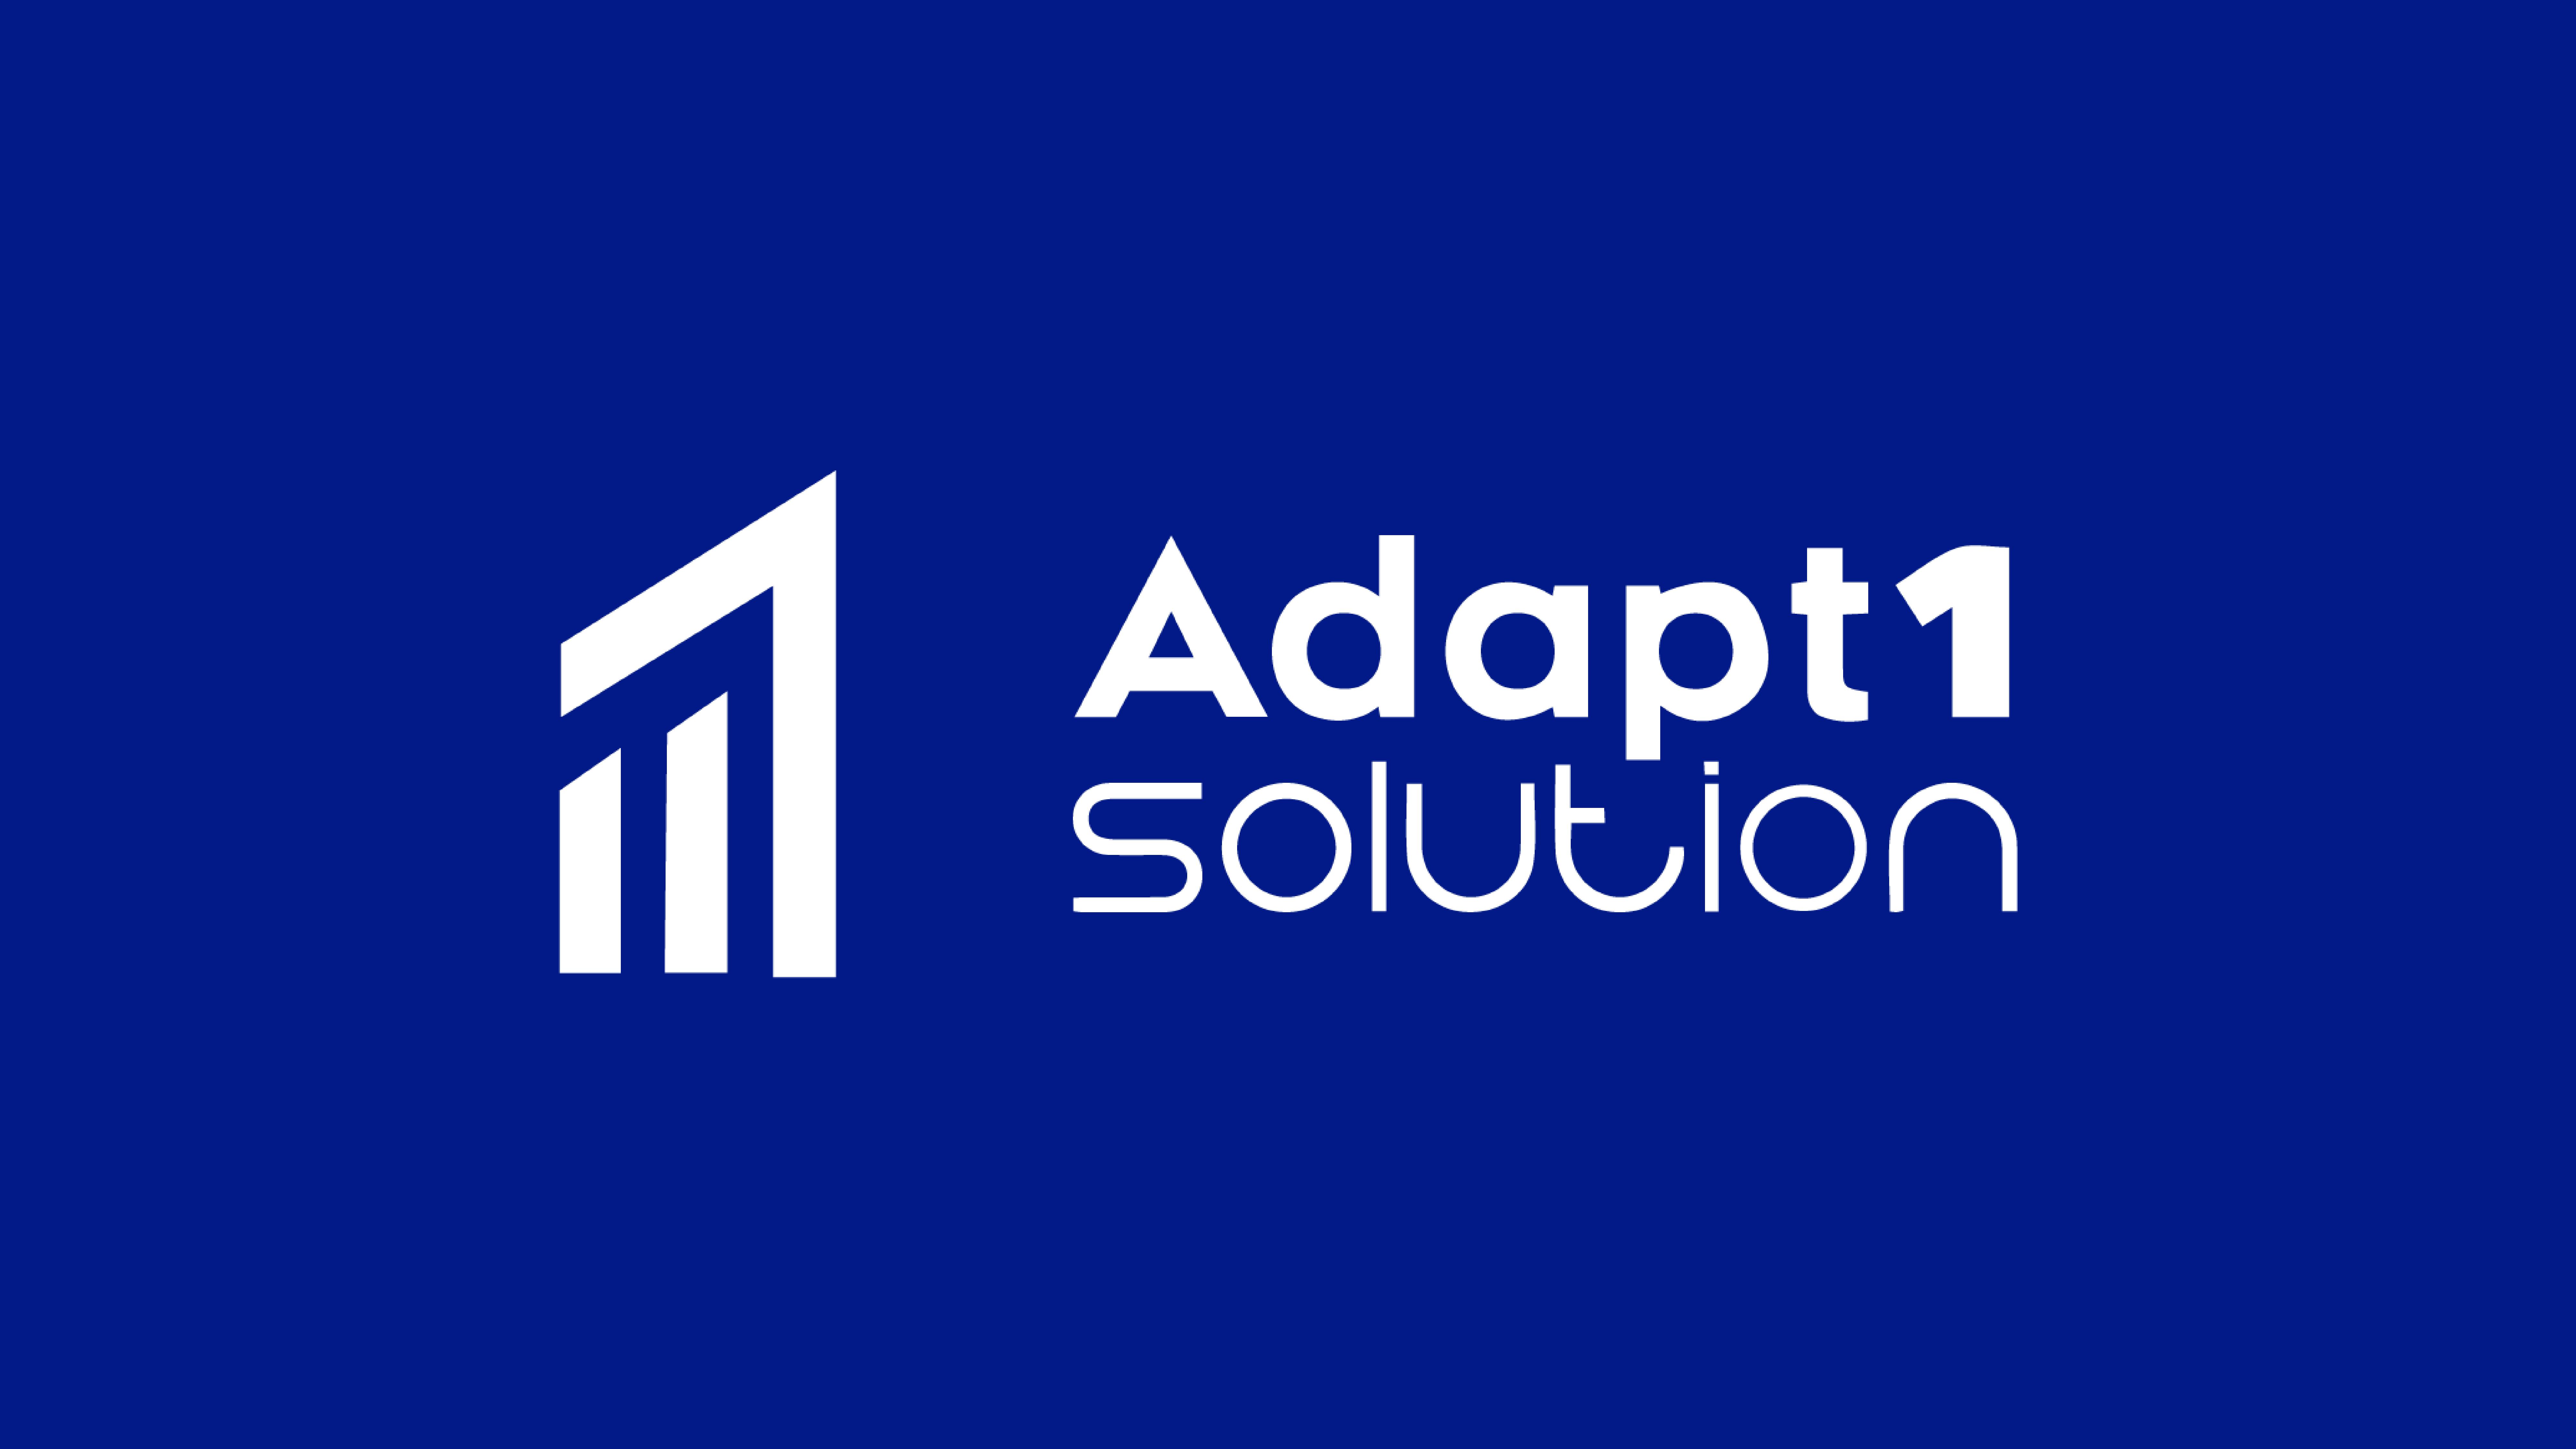 Adapt1solution logo